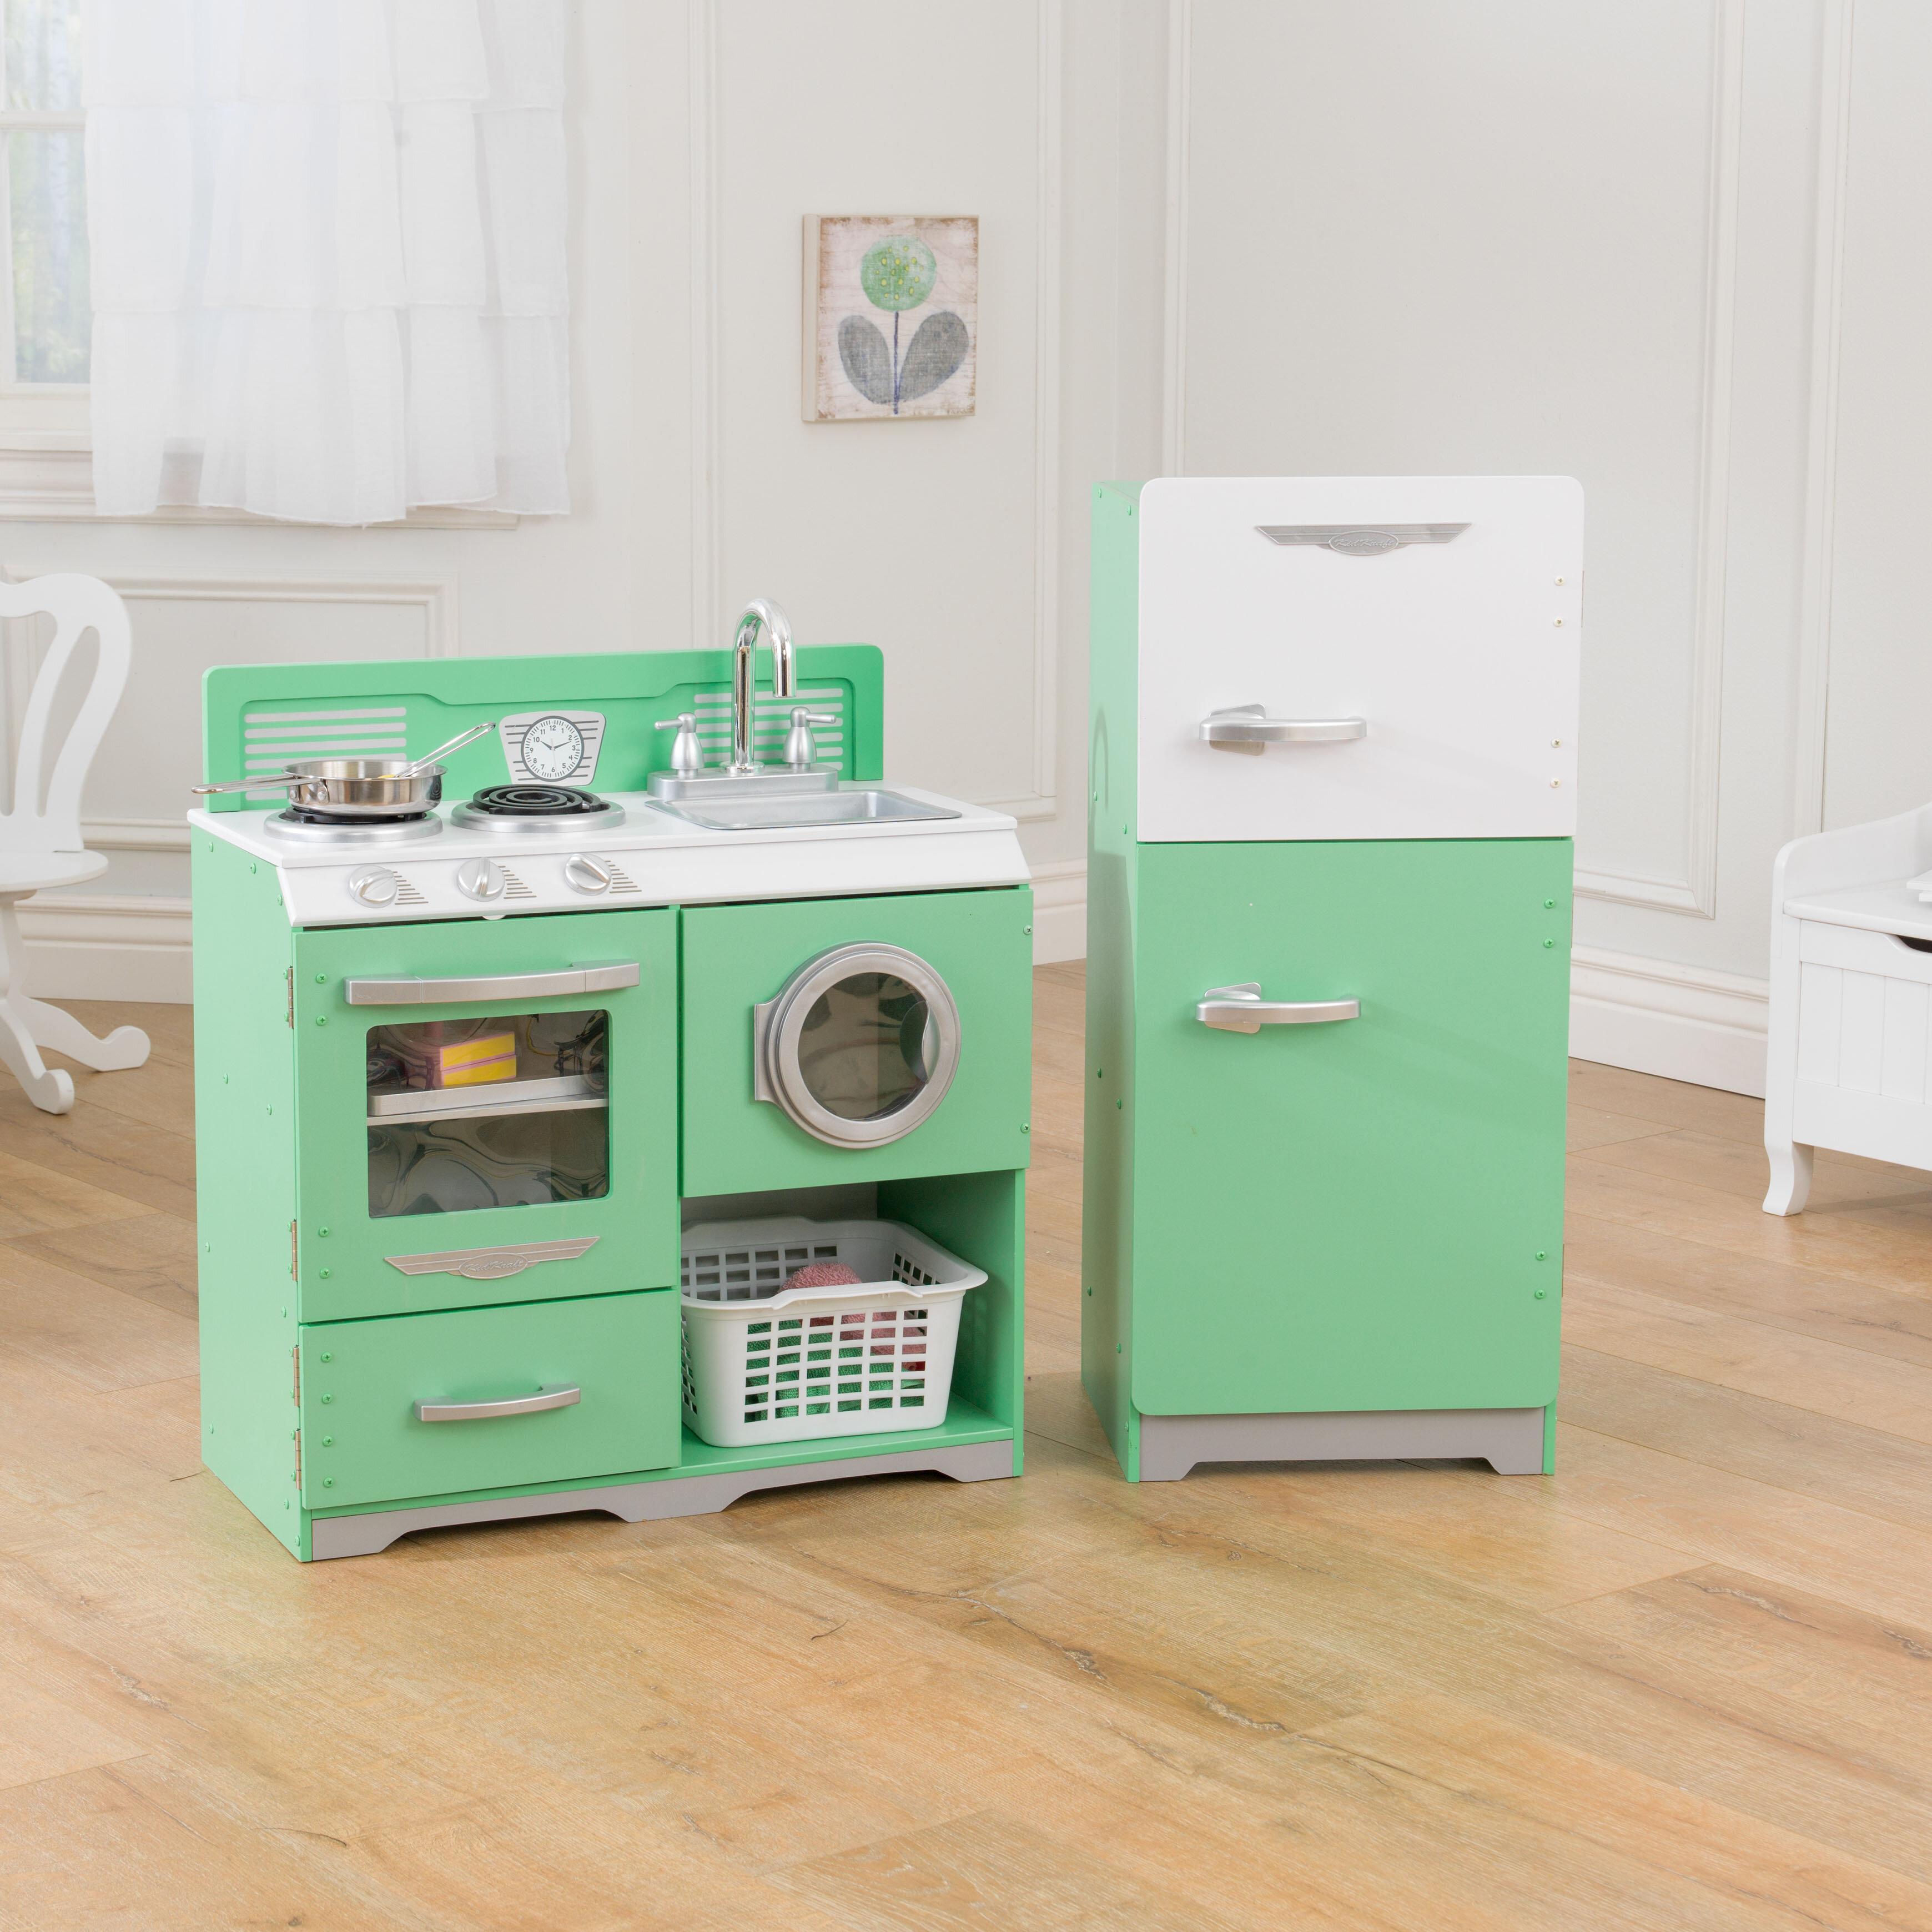 Kitchen Set Means